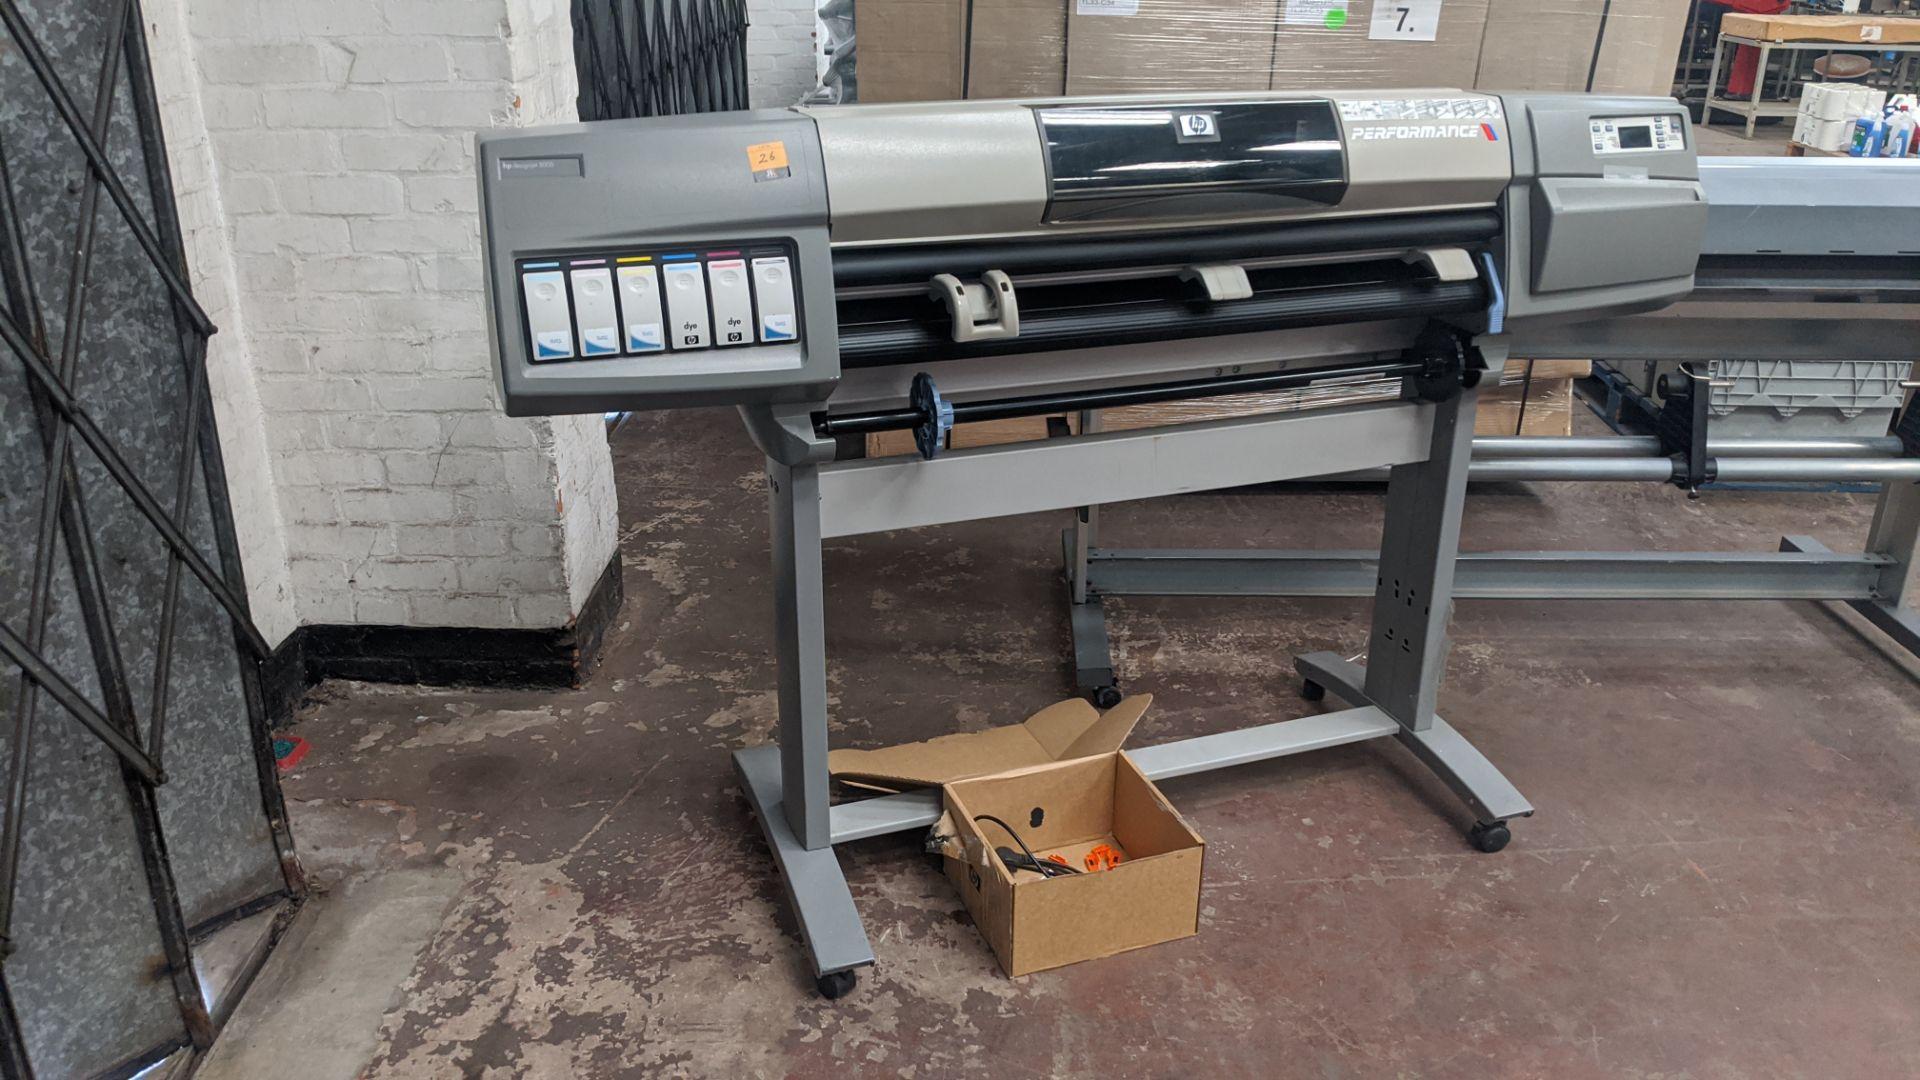 Lot 26 - HP DesignJet 5000 wide format printer, factory model C6090Z, model no. C6090A